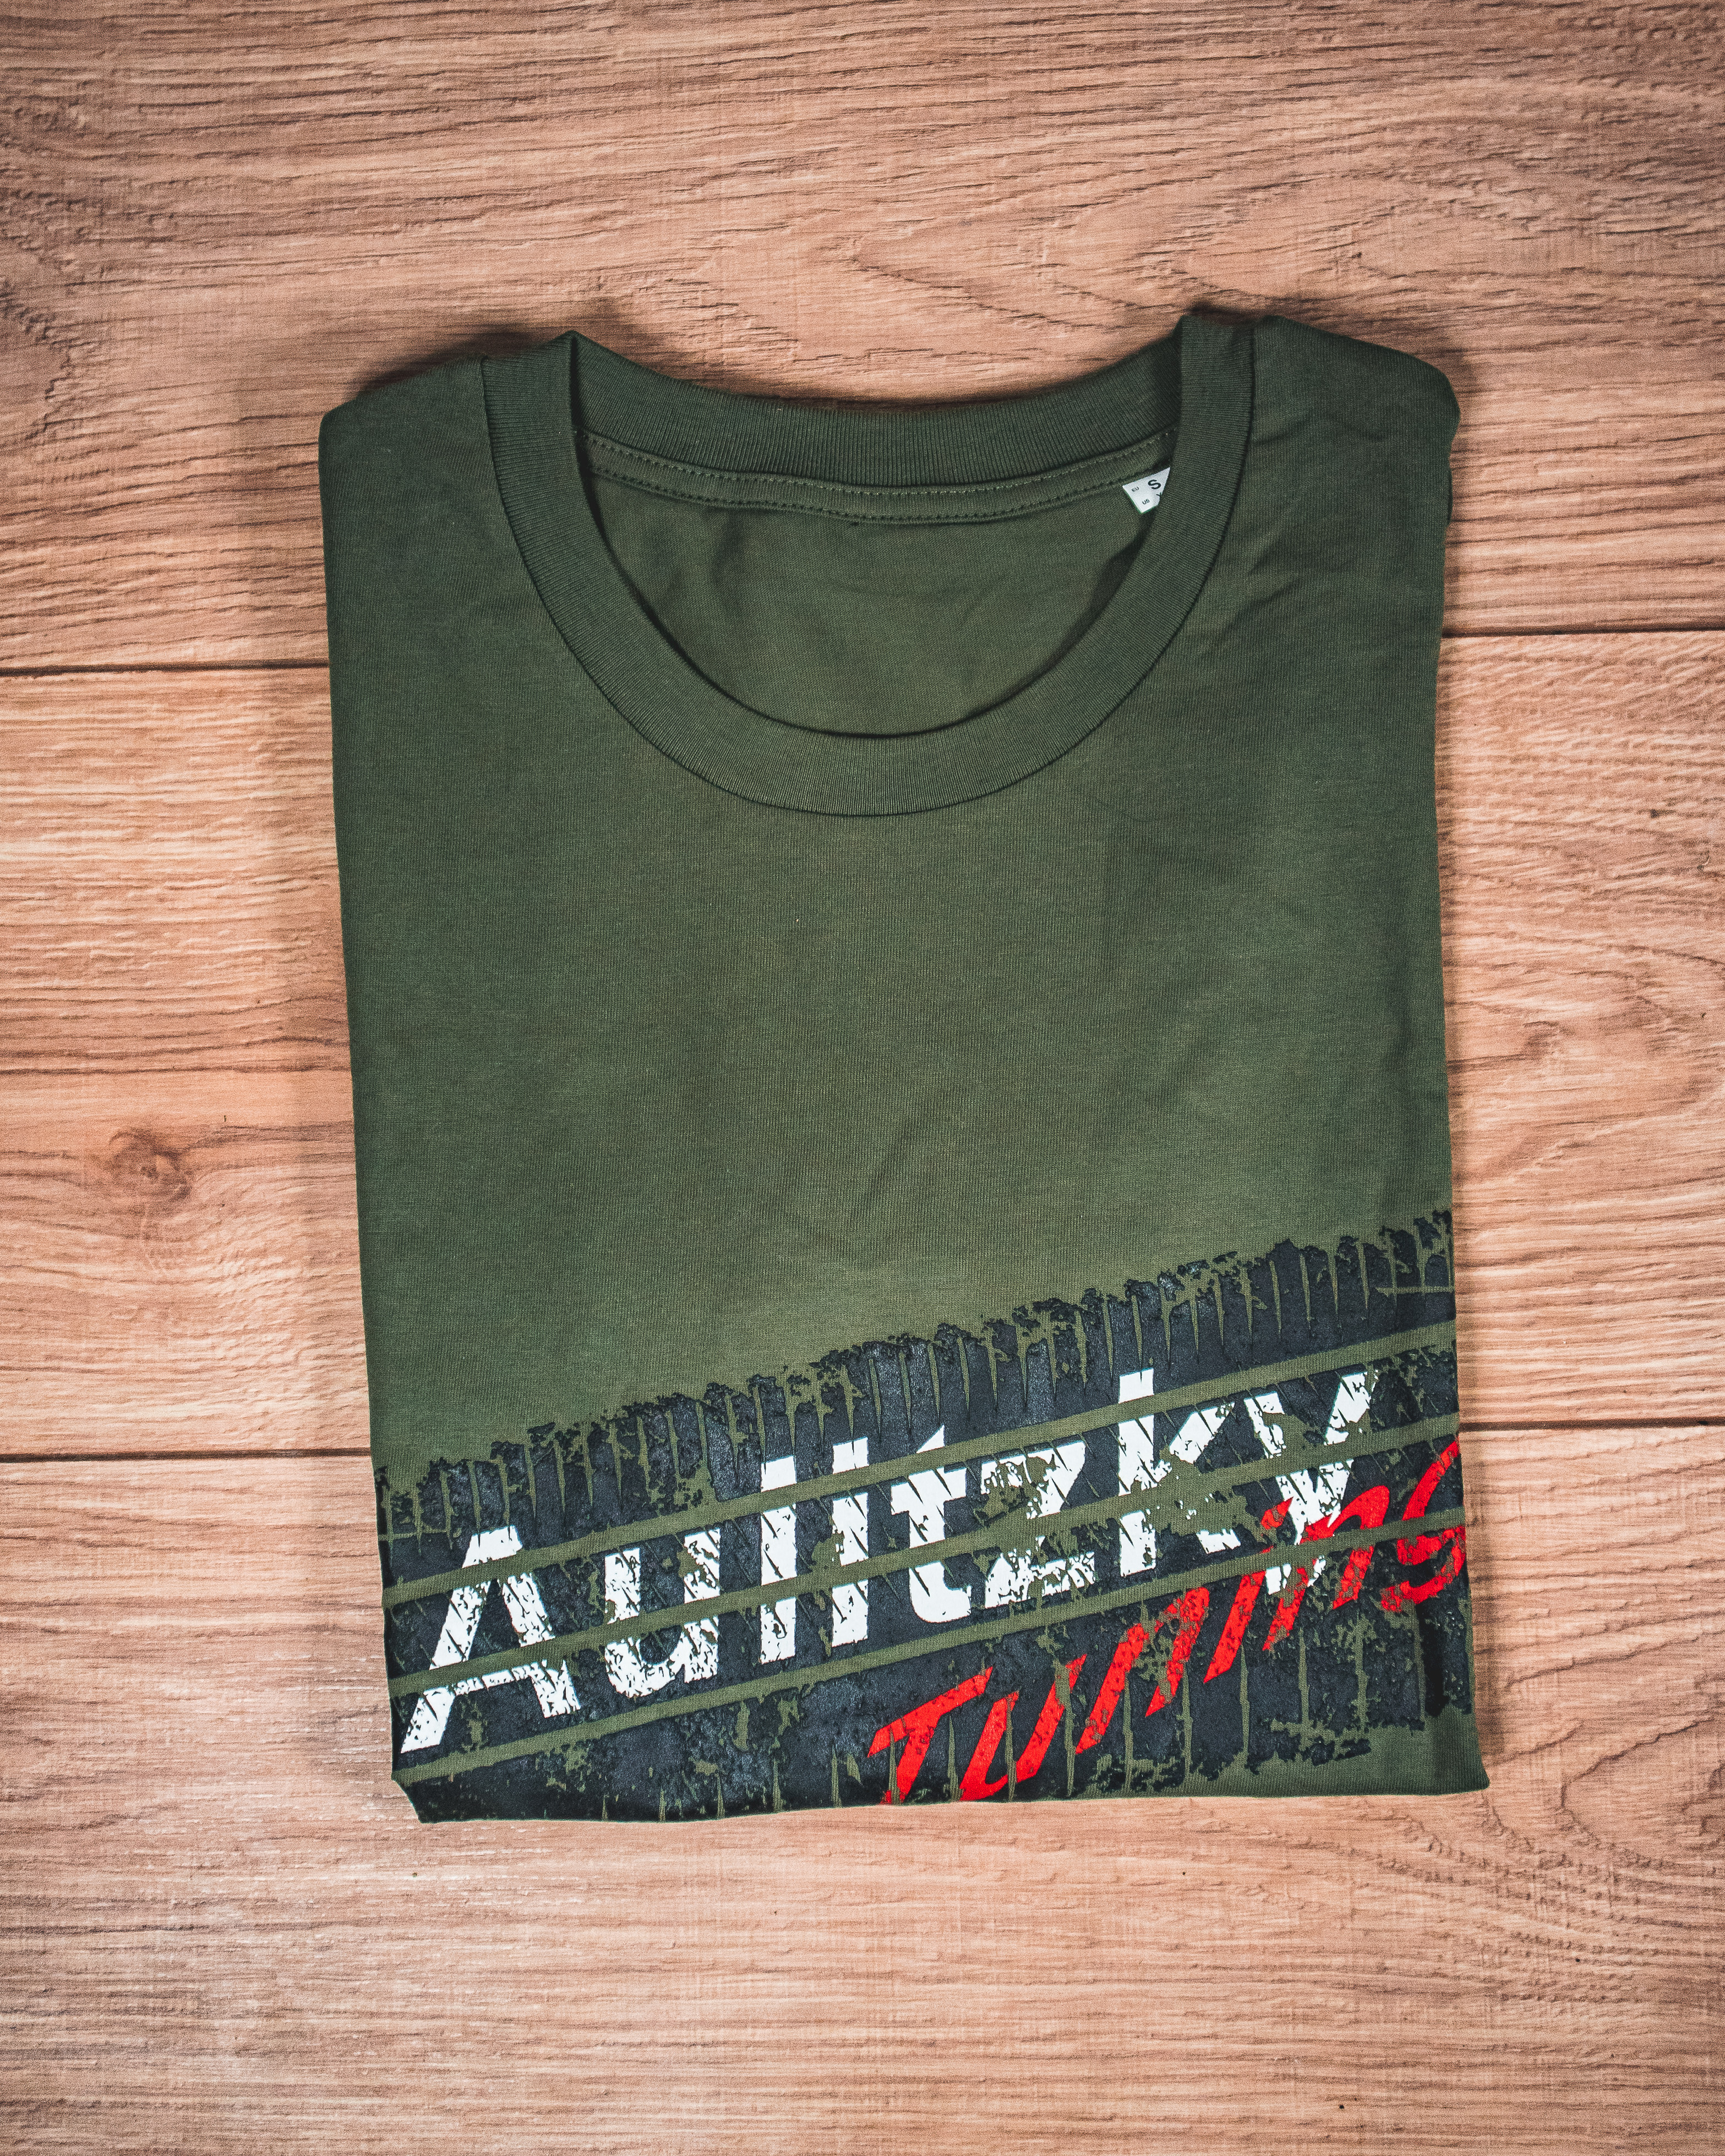 Aulitzky Tuning T-Shirt Reifenspur olivegrün